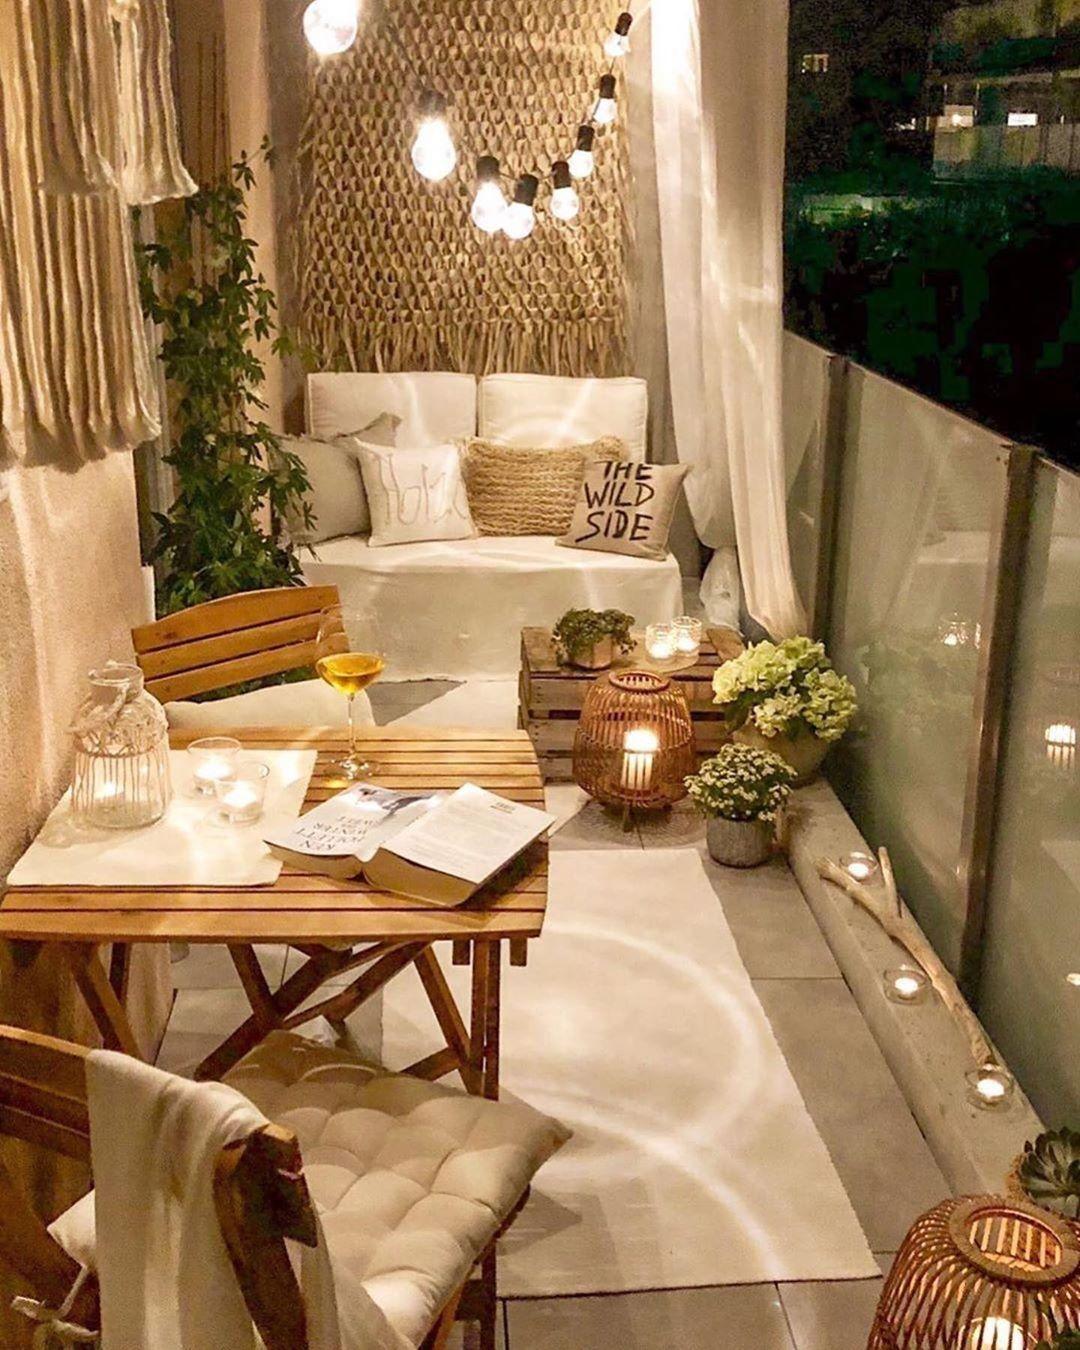 apartmentbalconydecorating  Balcony decor, Small balcony decor